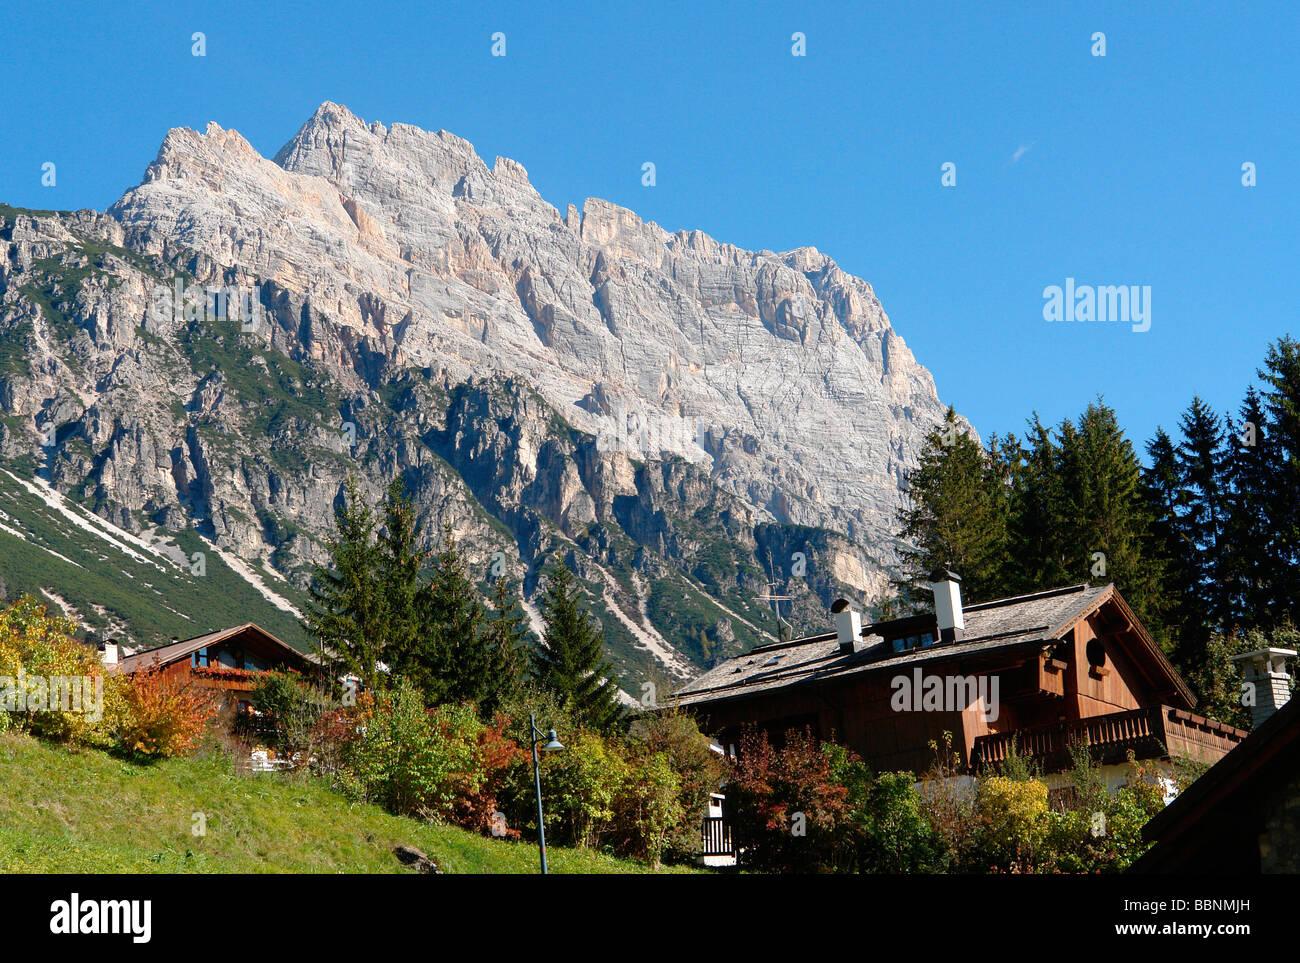 geography / travel, Italy, Trentino - Alto Adige, Cortina d'Ampezzo: Landscape with Sorapis Massif, typical - Stock Image